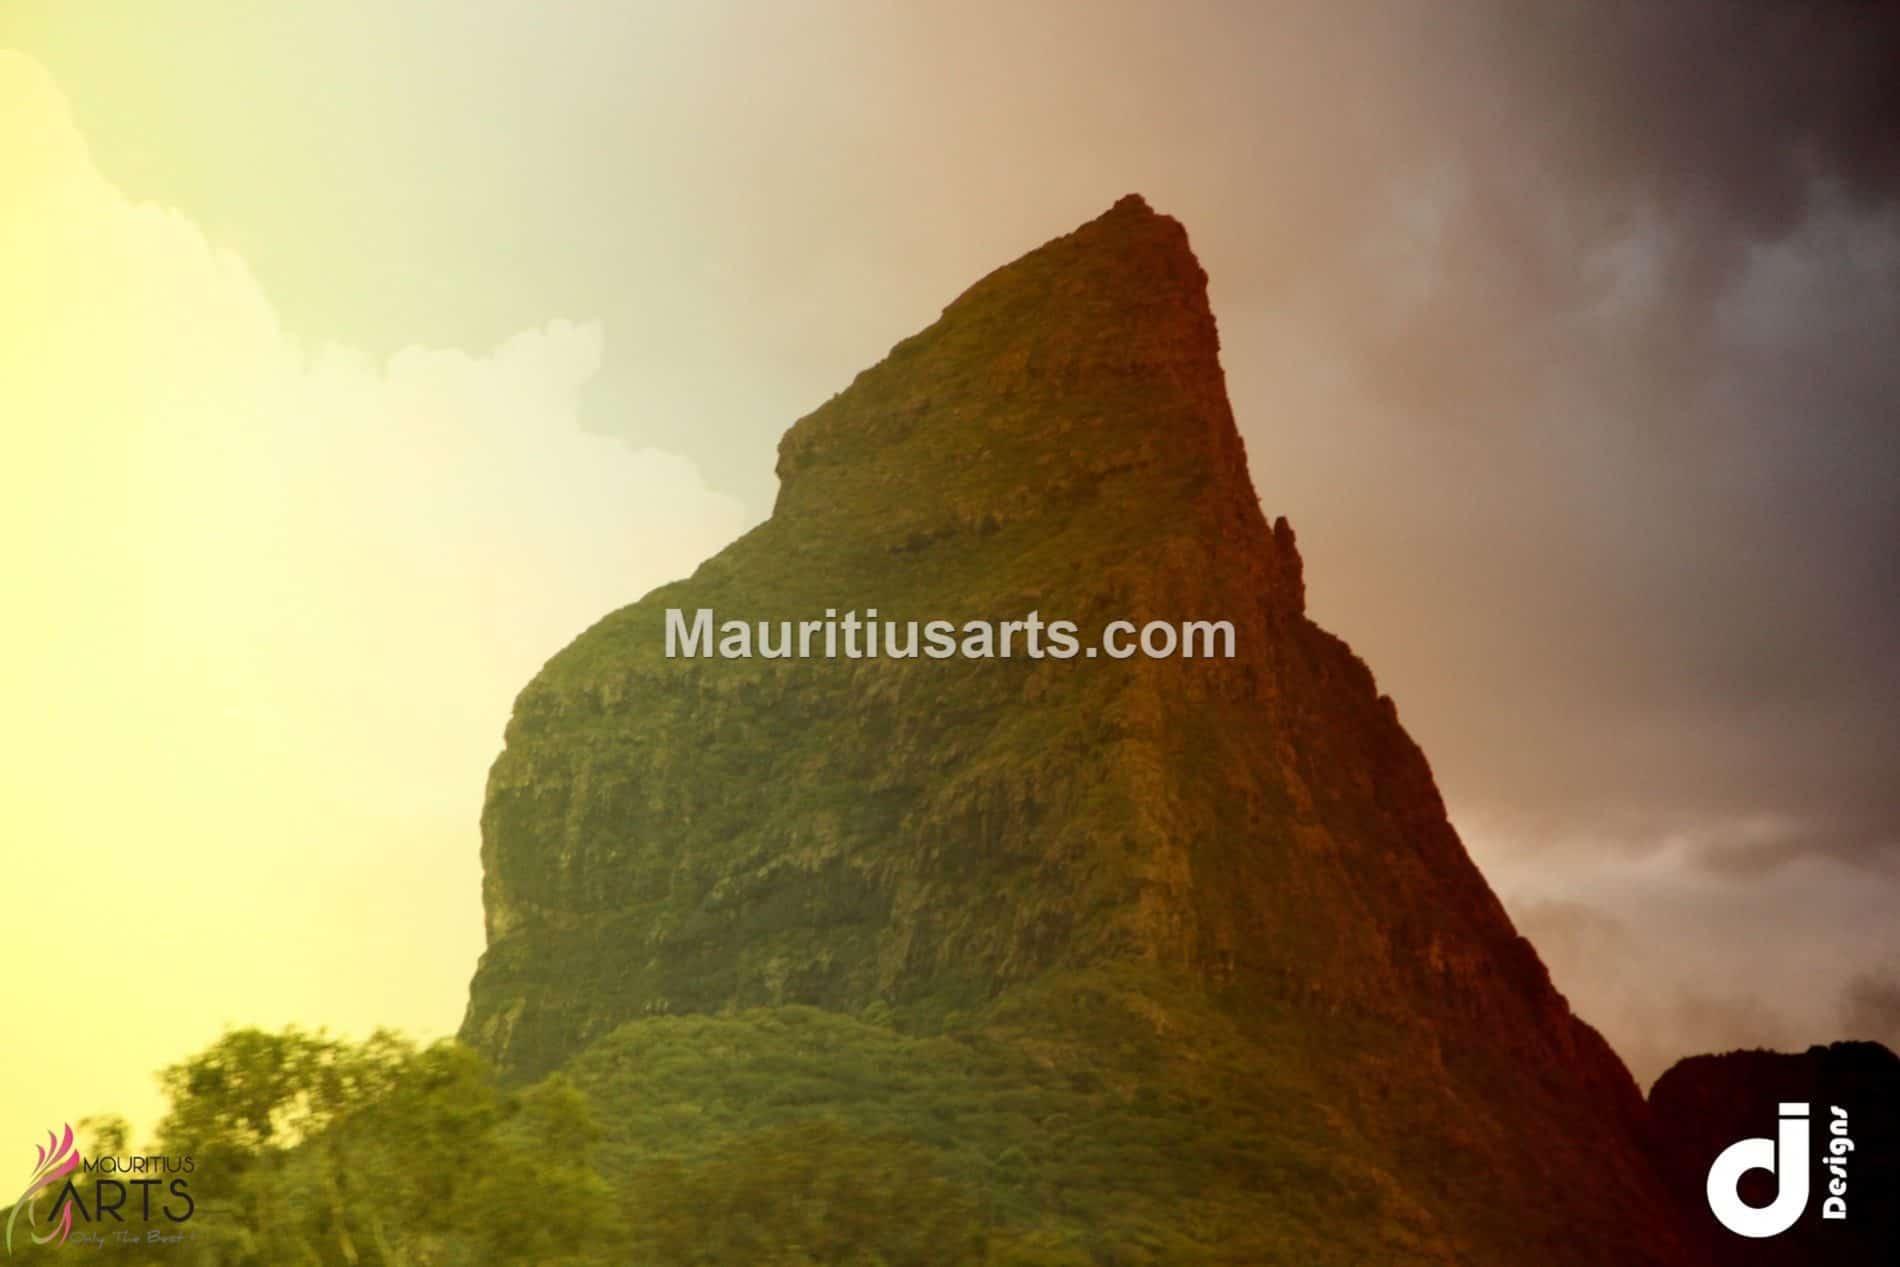 mauritius-arts-djunaid-jeetoo-highlights-and-challenges